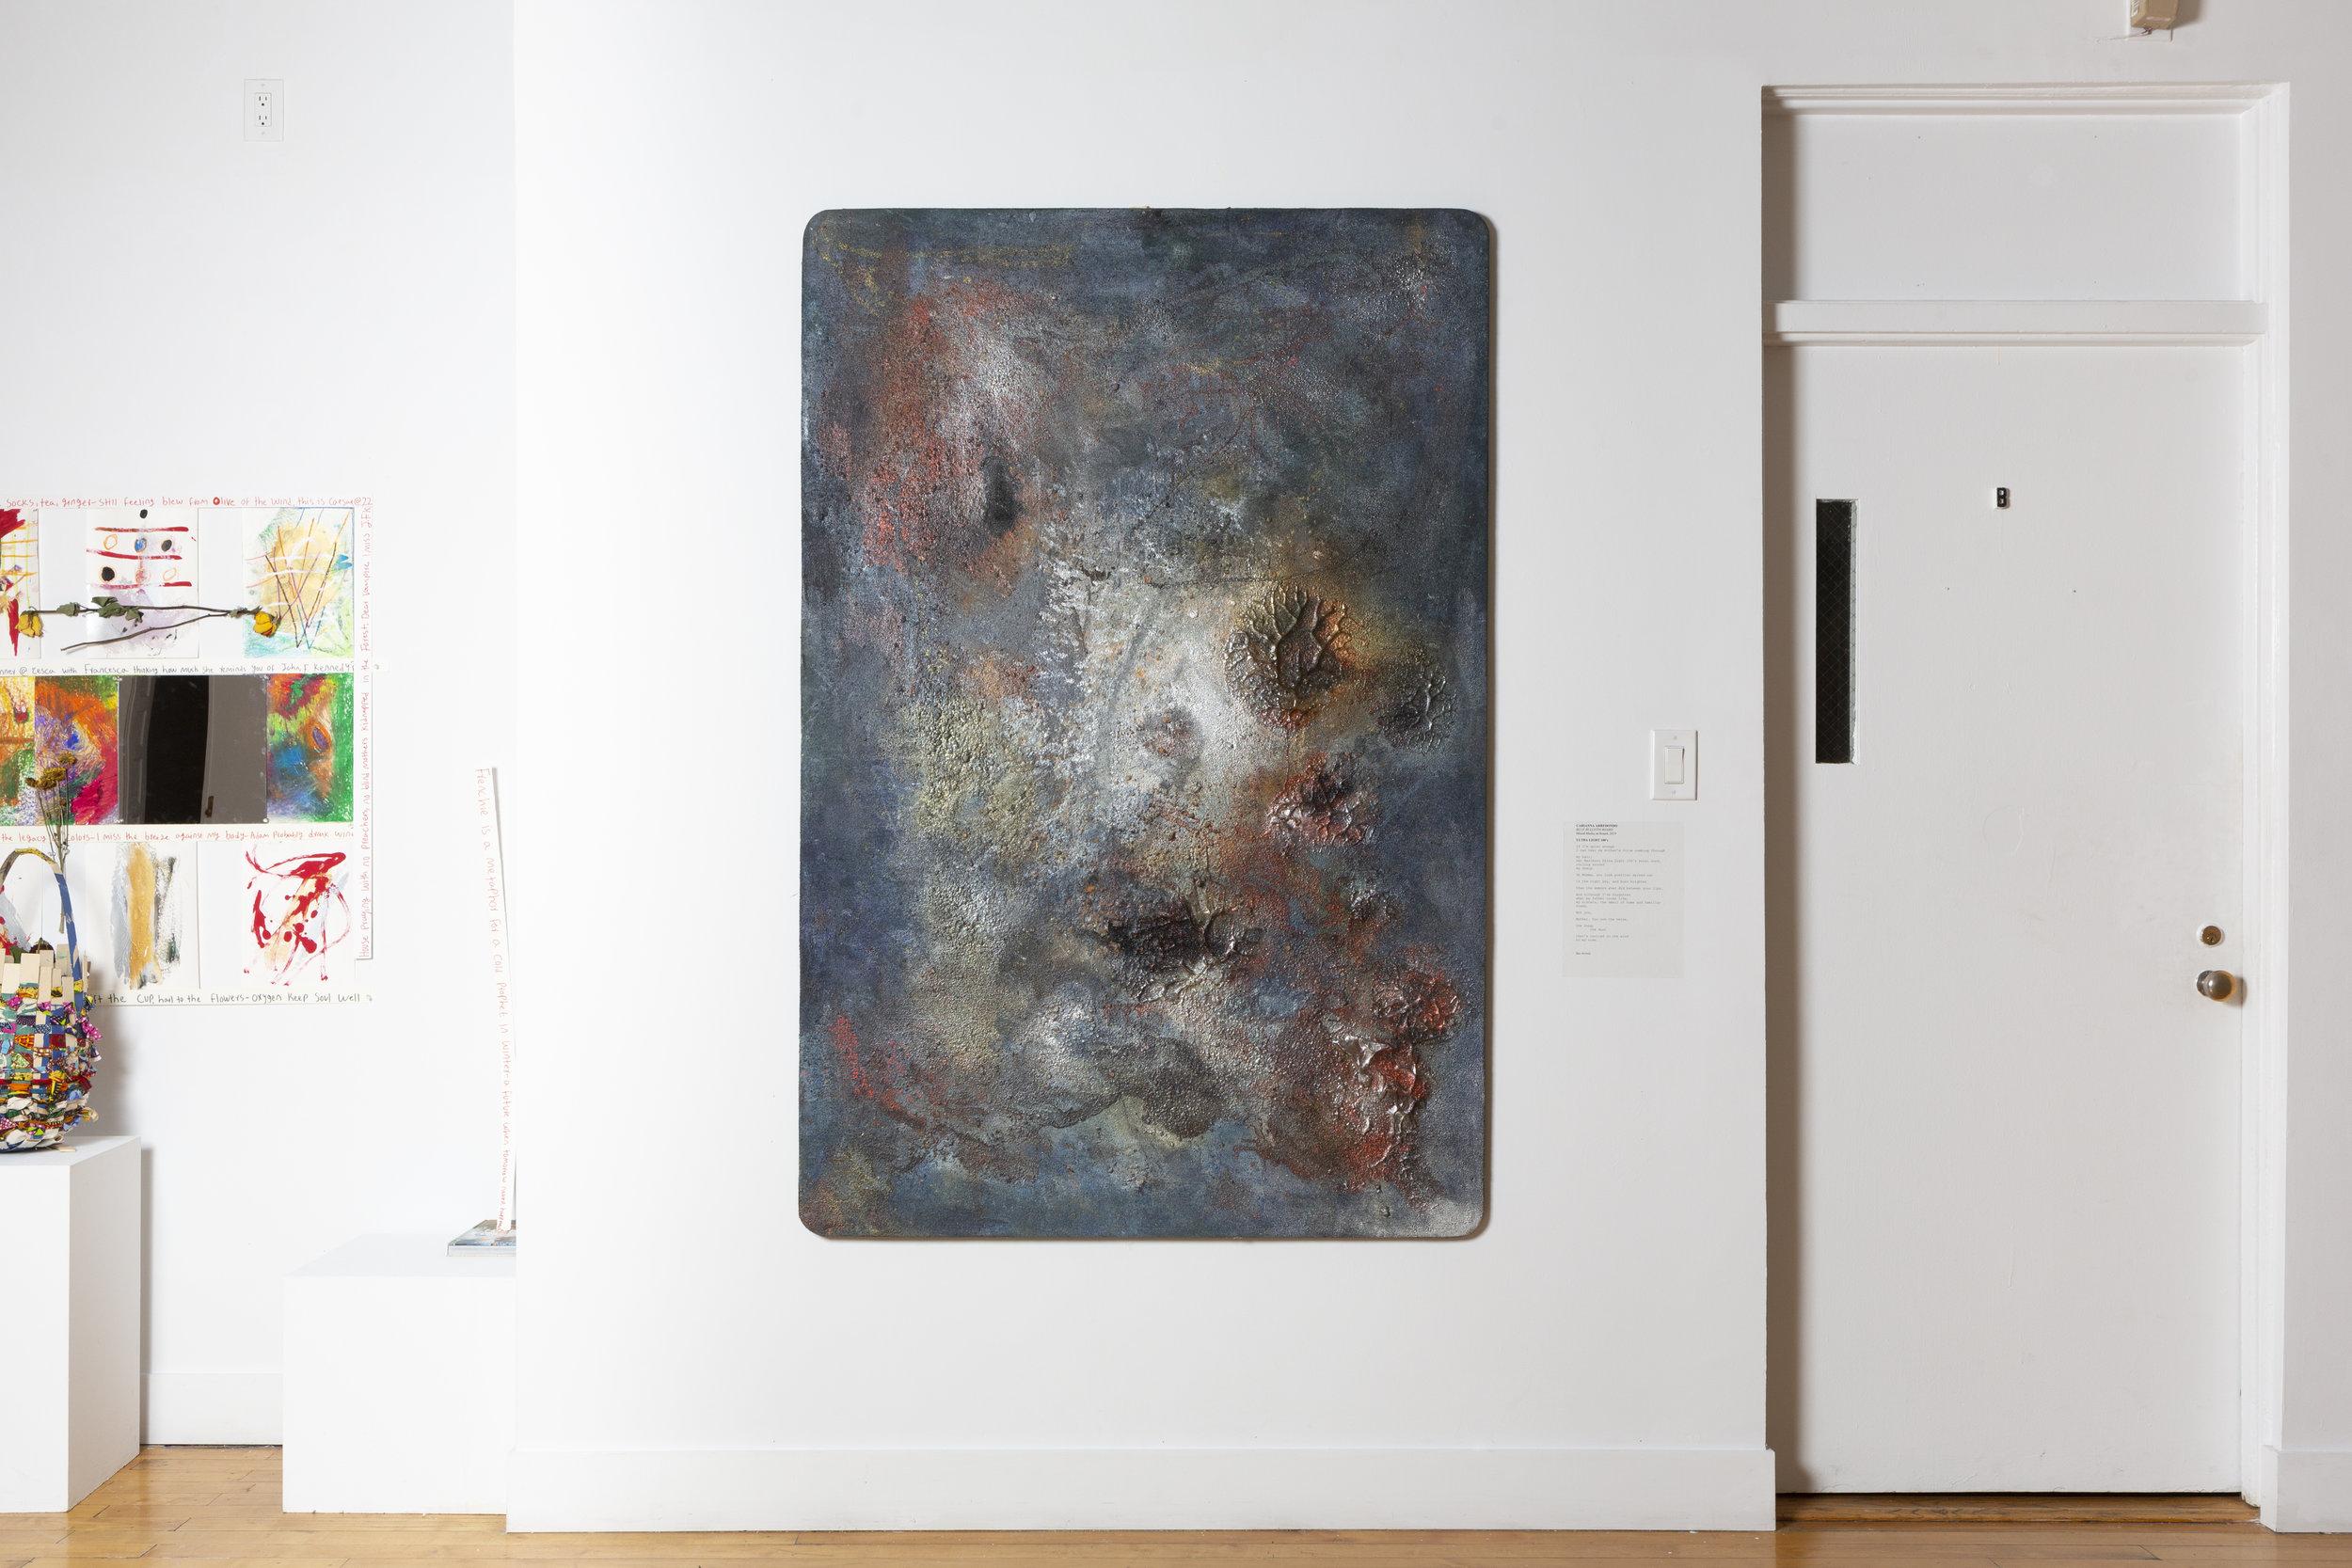 Carianna Columbia Art 2019 in space full_04.jpg